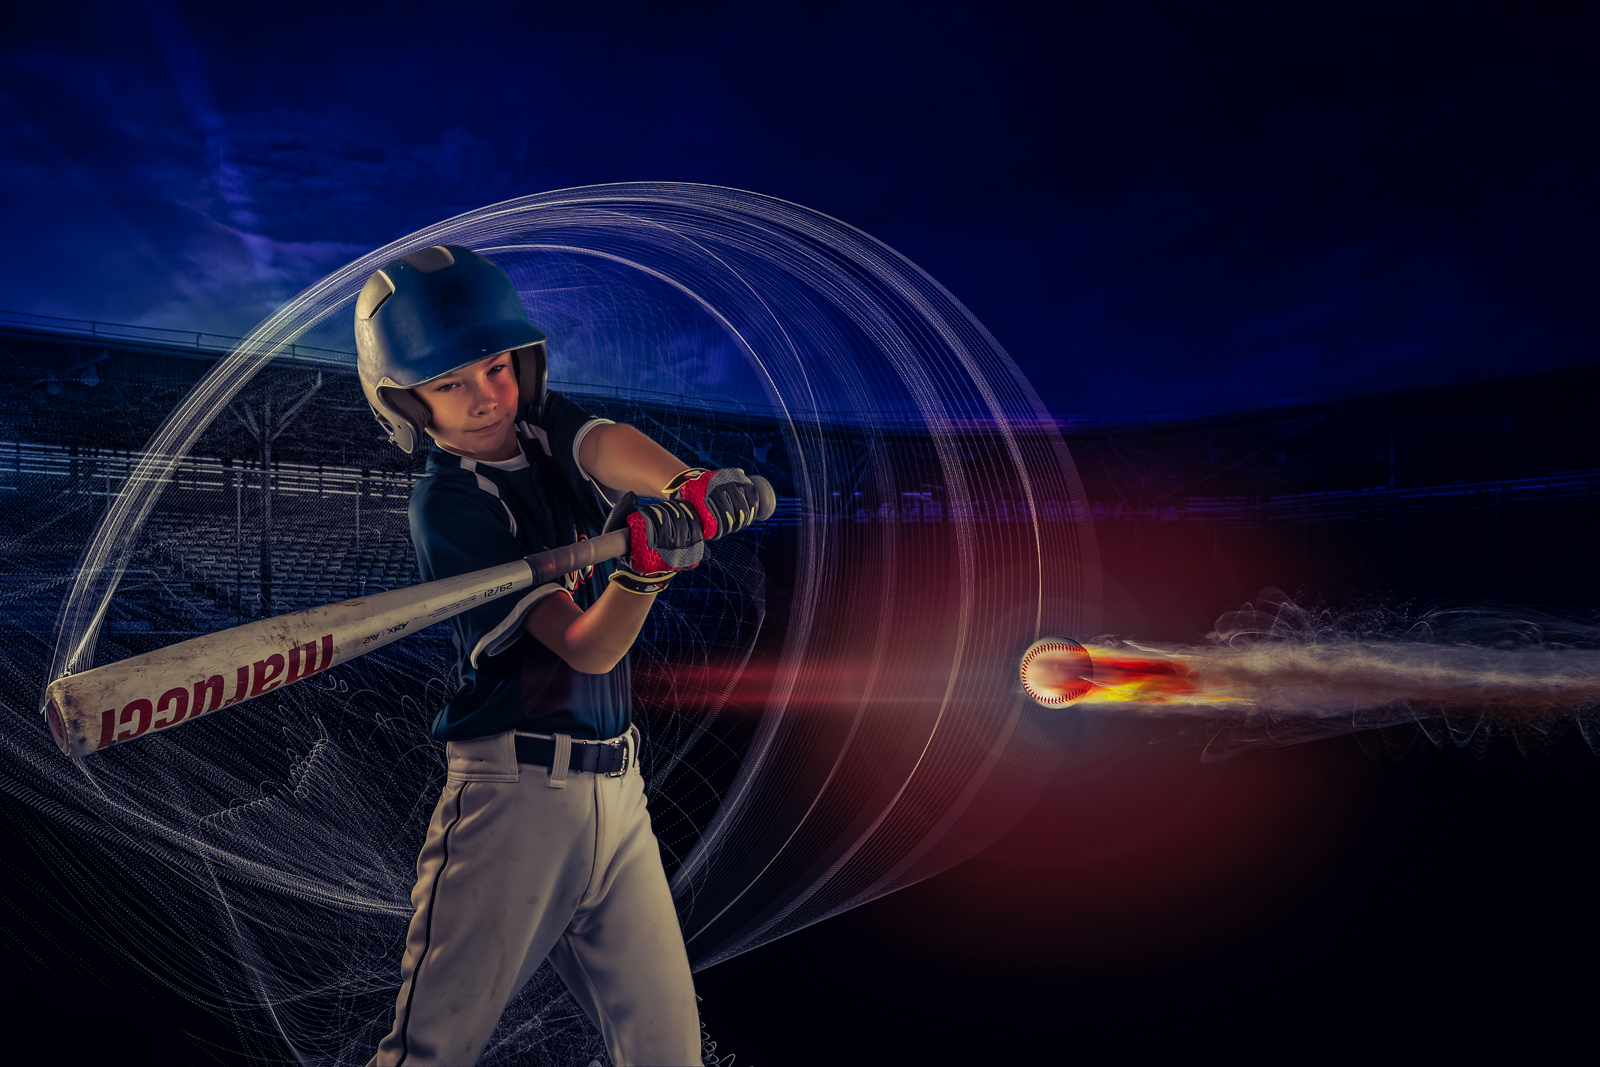 Passion-1-8 Sportography